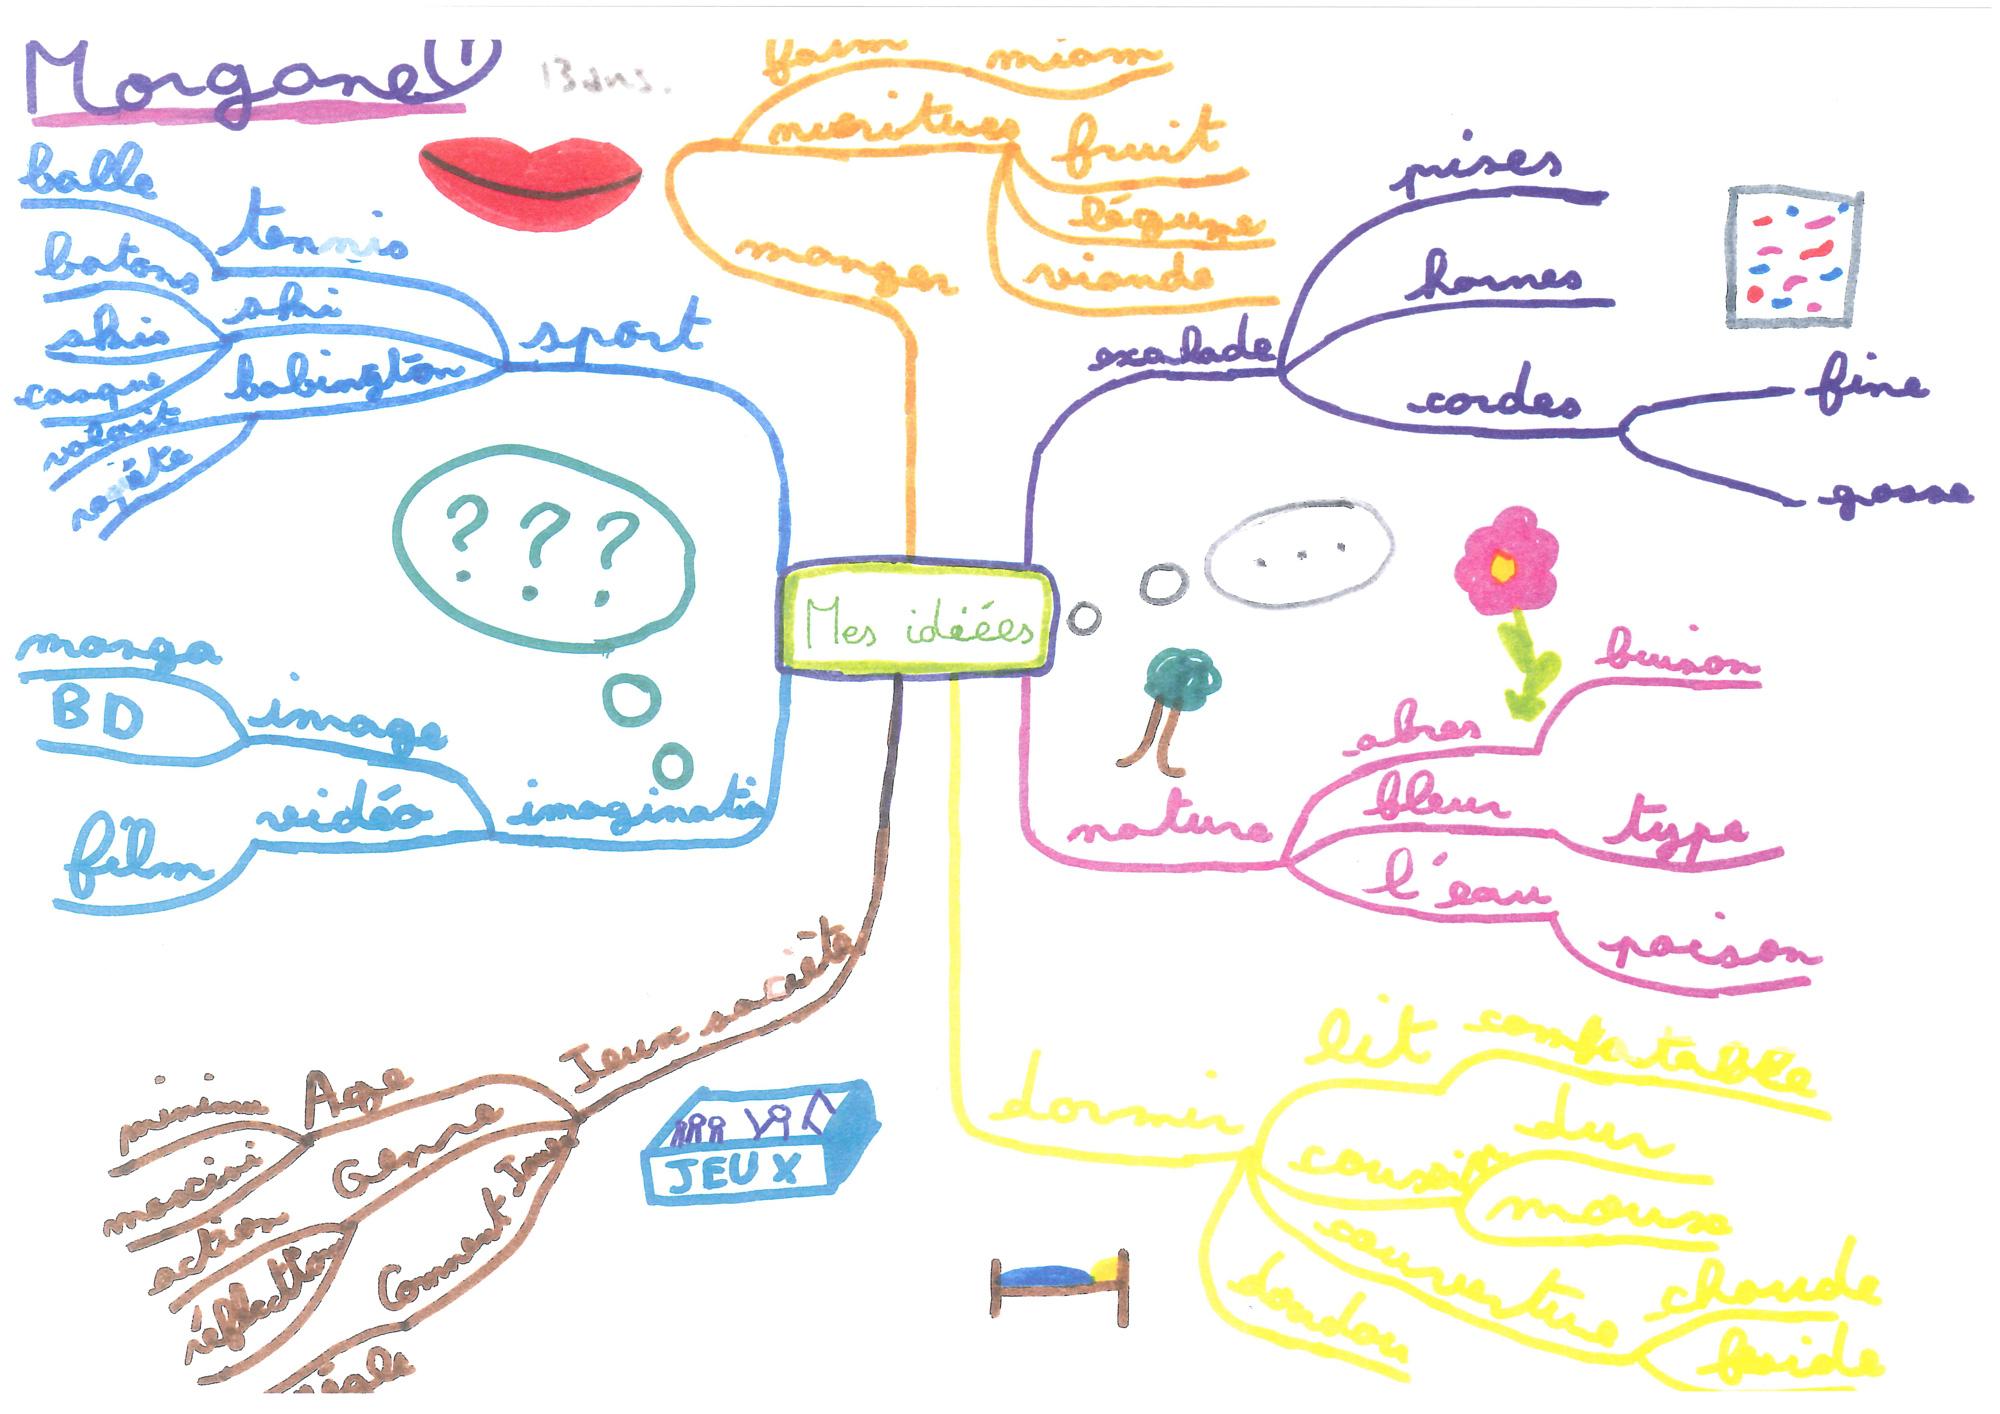 Mind-Mapping-Enfants-(Mes-idées)